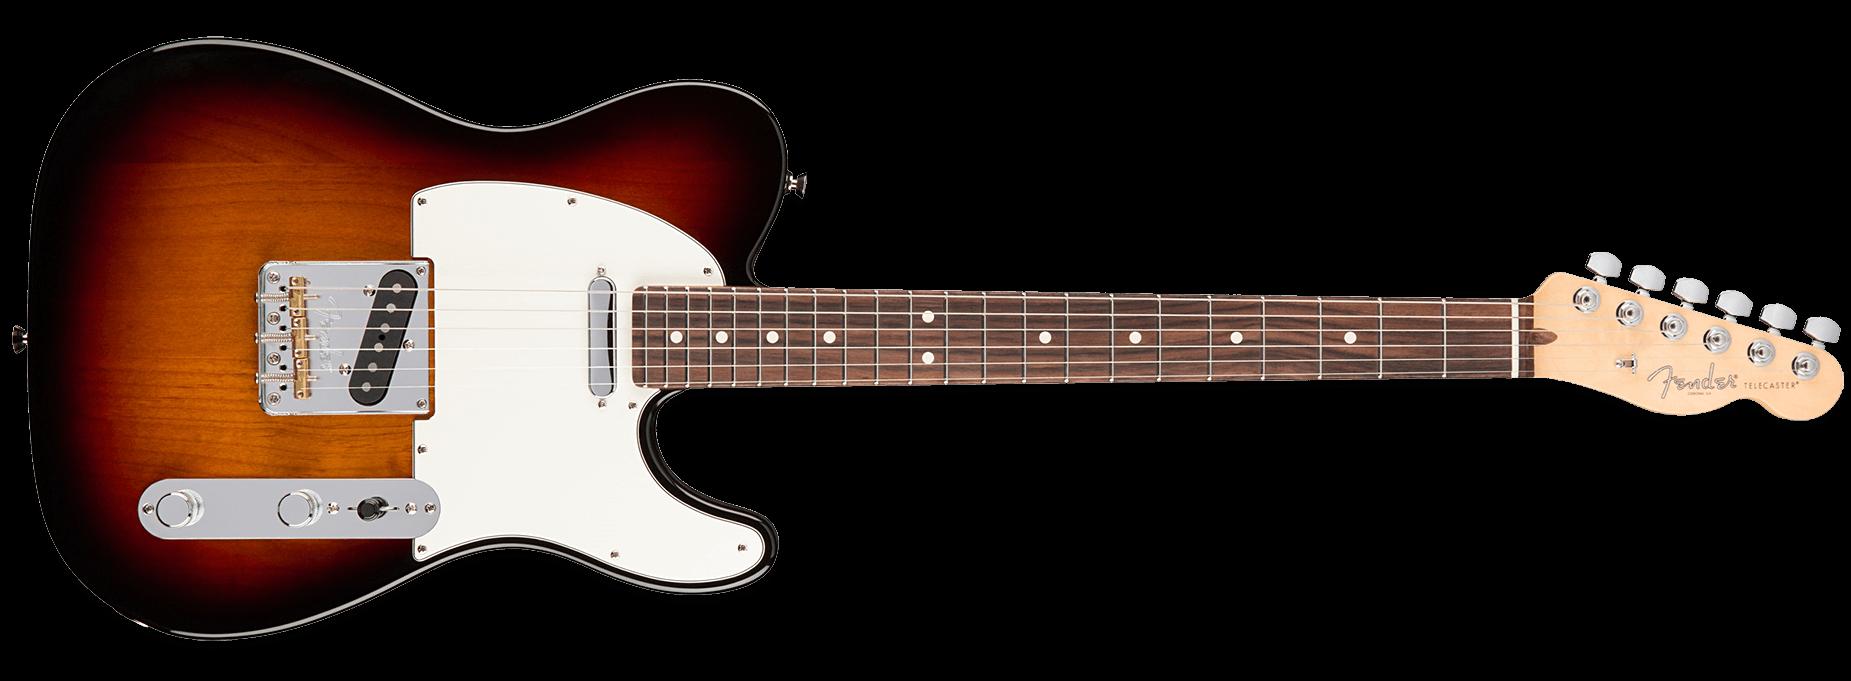 Fender American Professional Telecaster 3-Color Sunburst